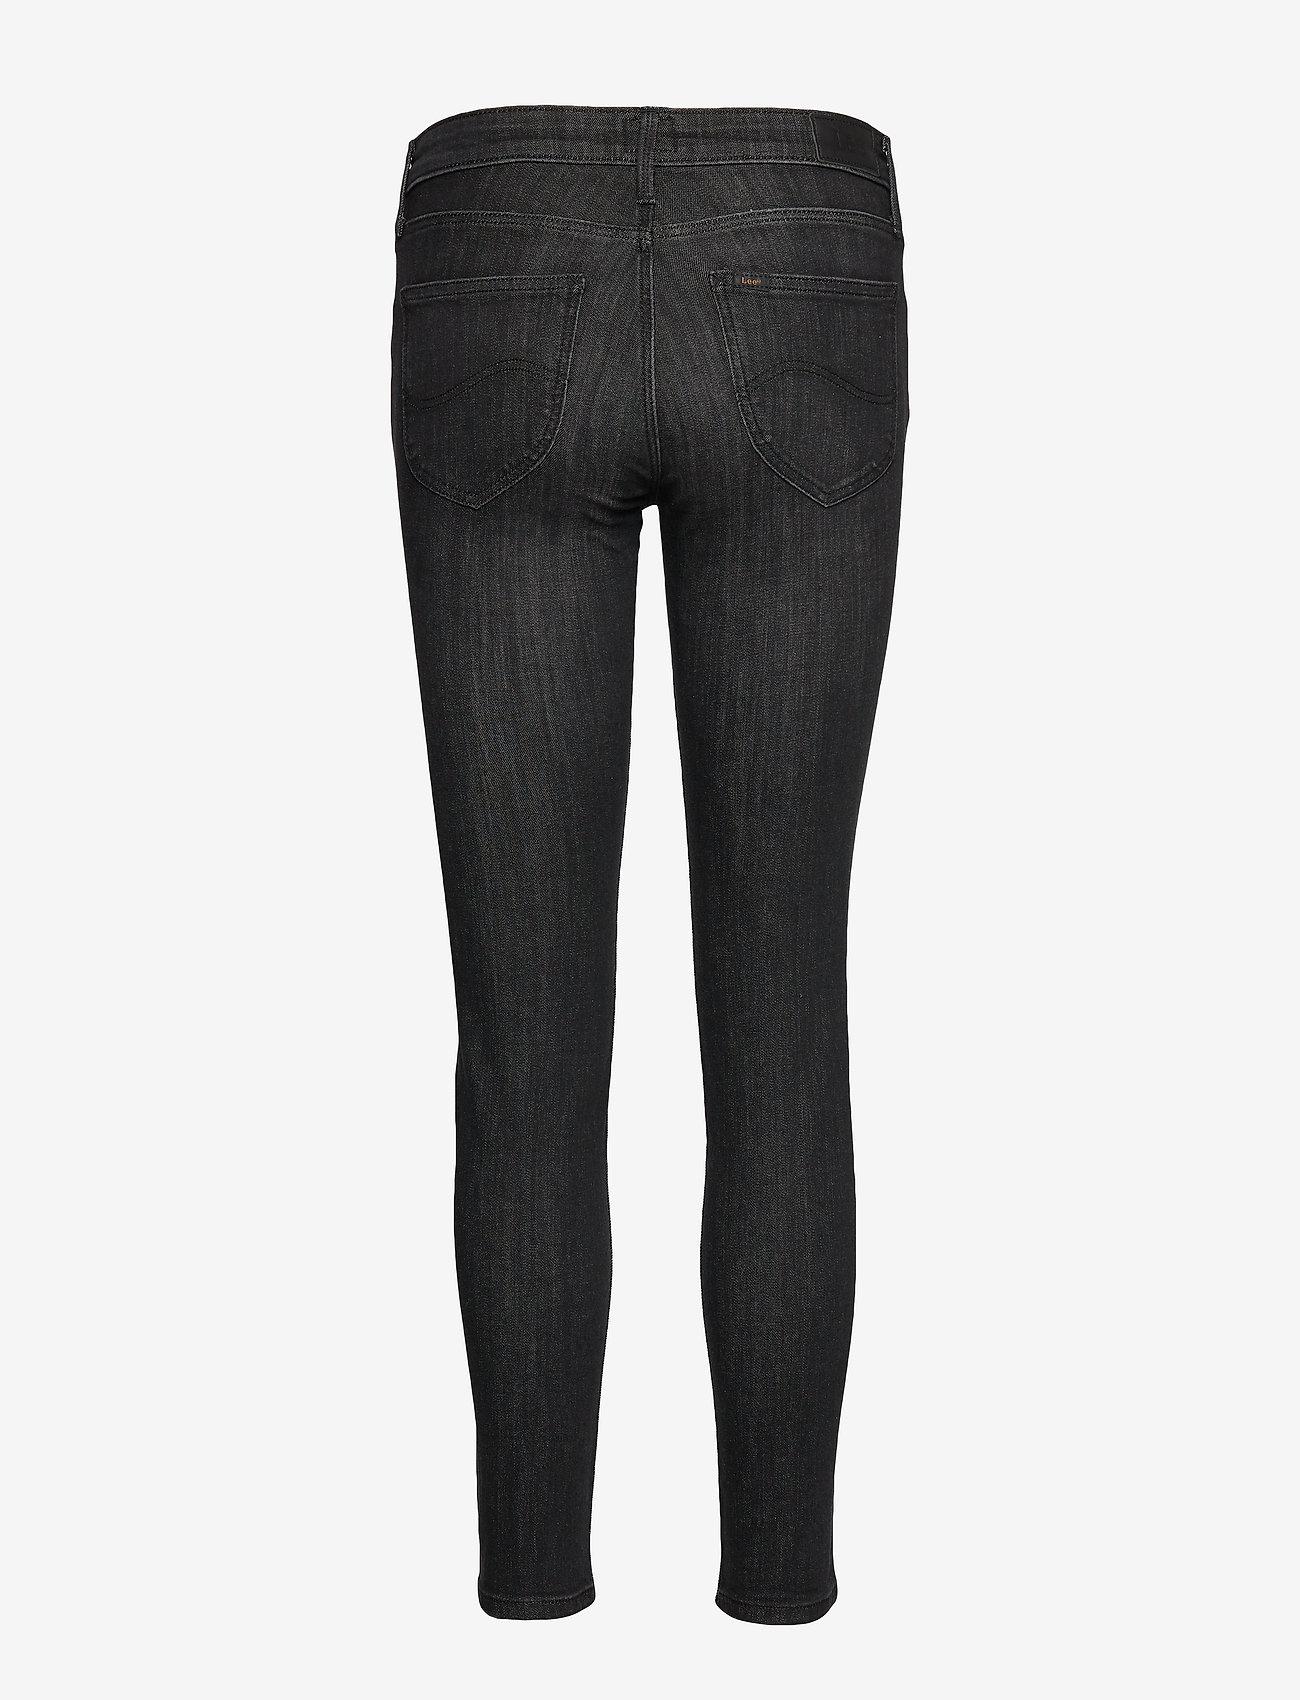 Lee Jeans - SCARLETT - skinny jeans - black orrick - 1